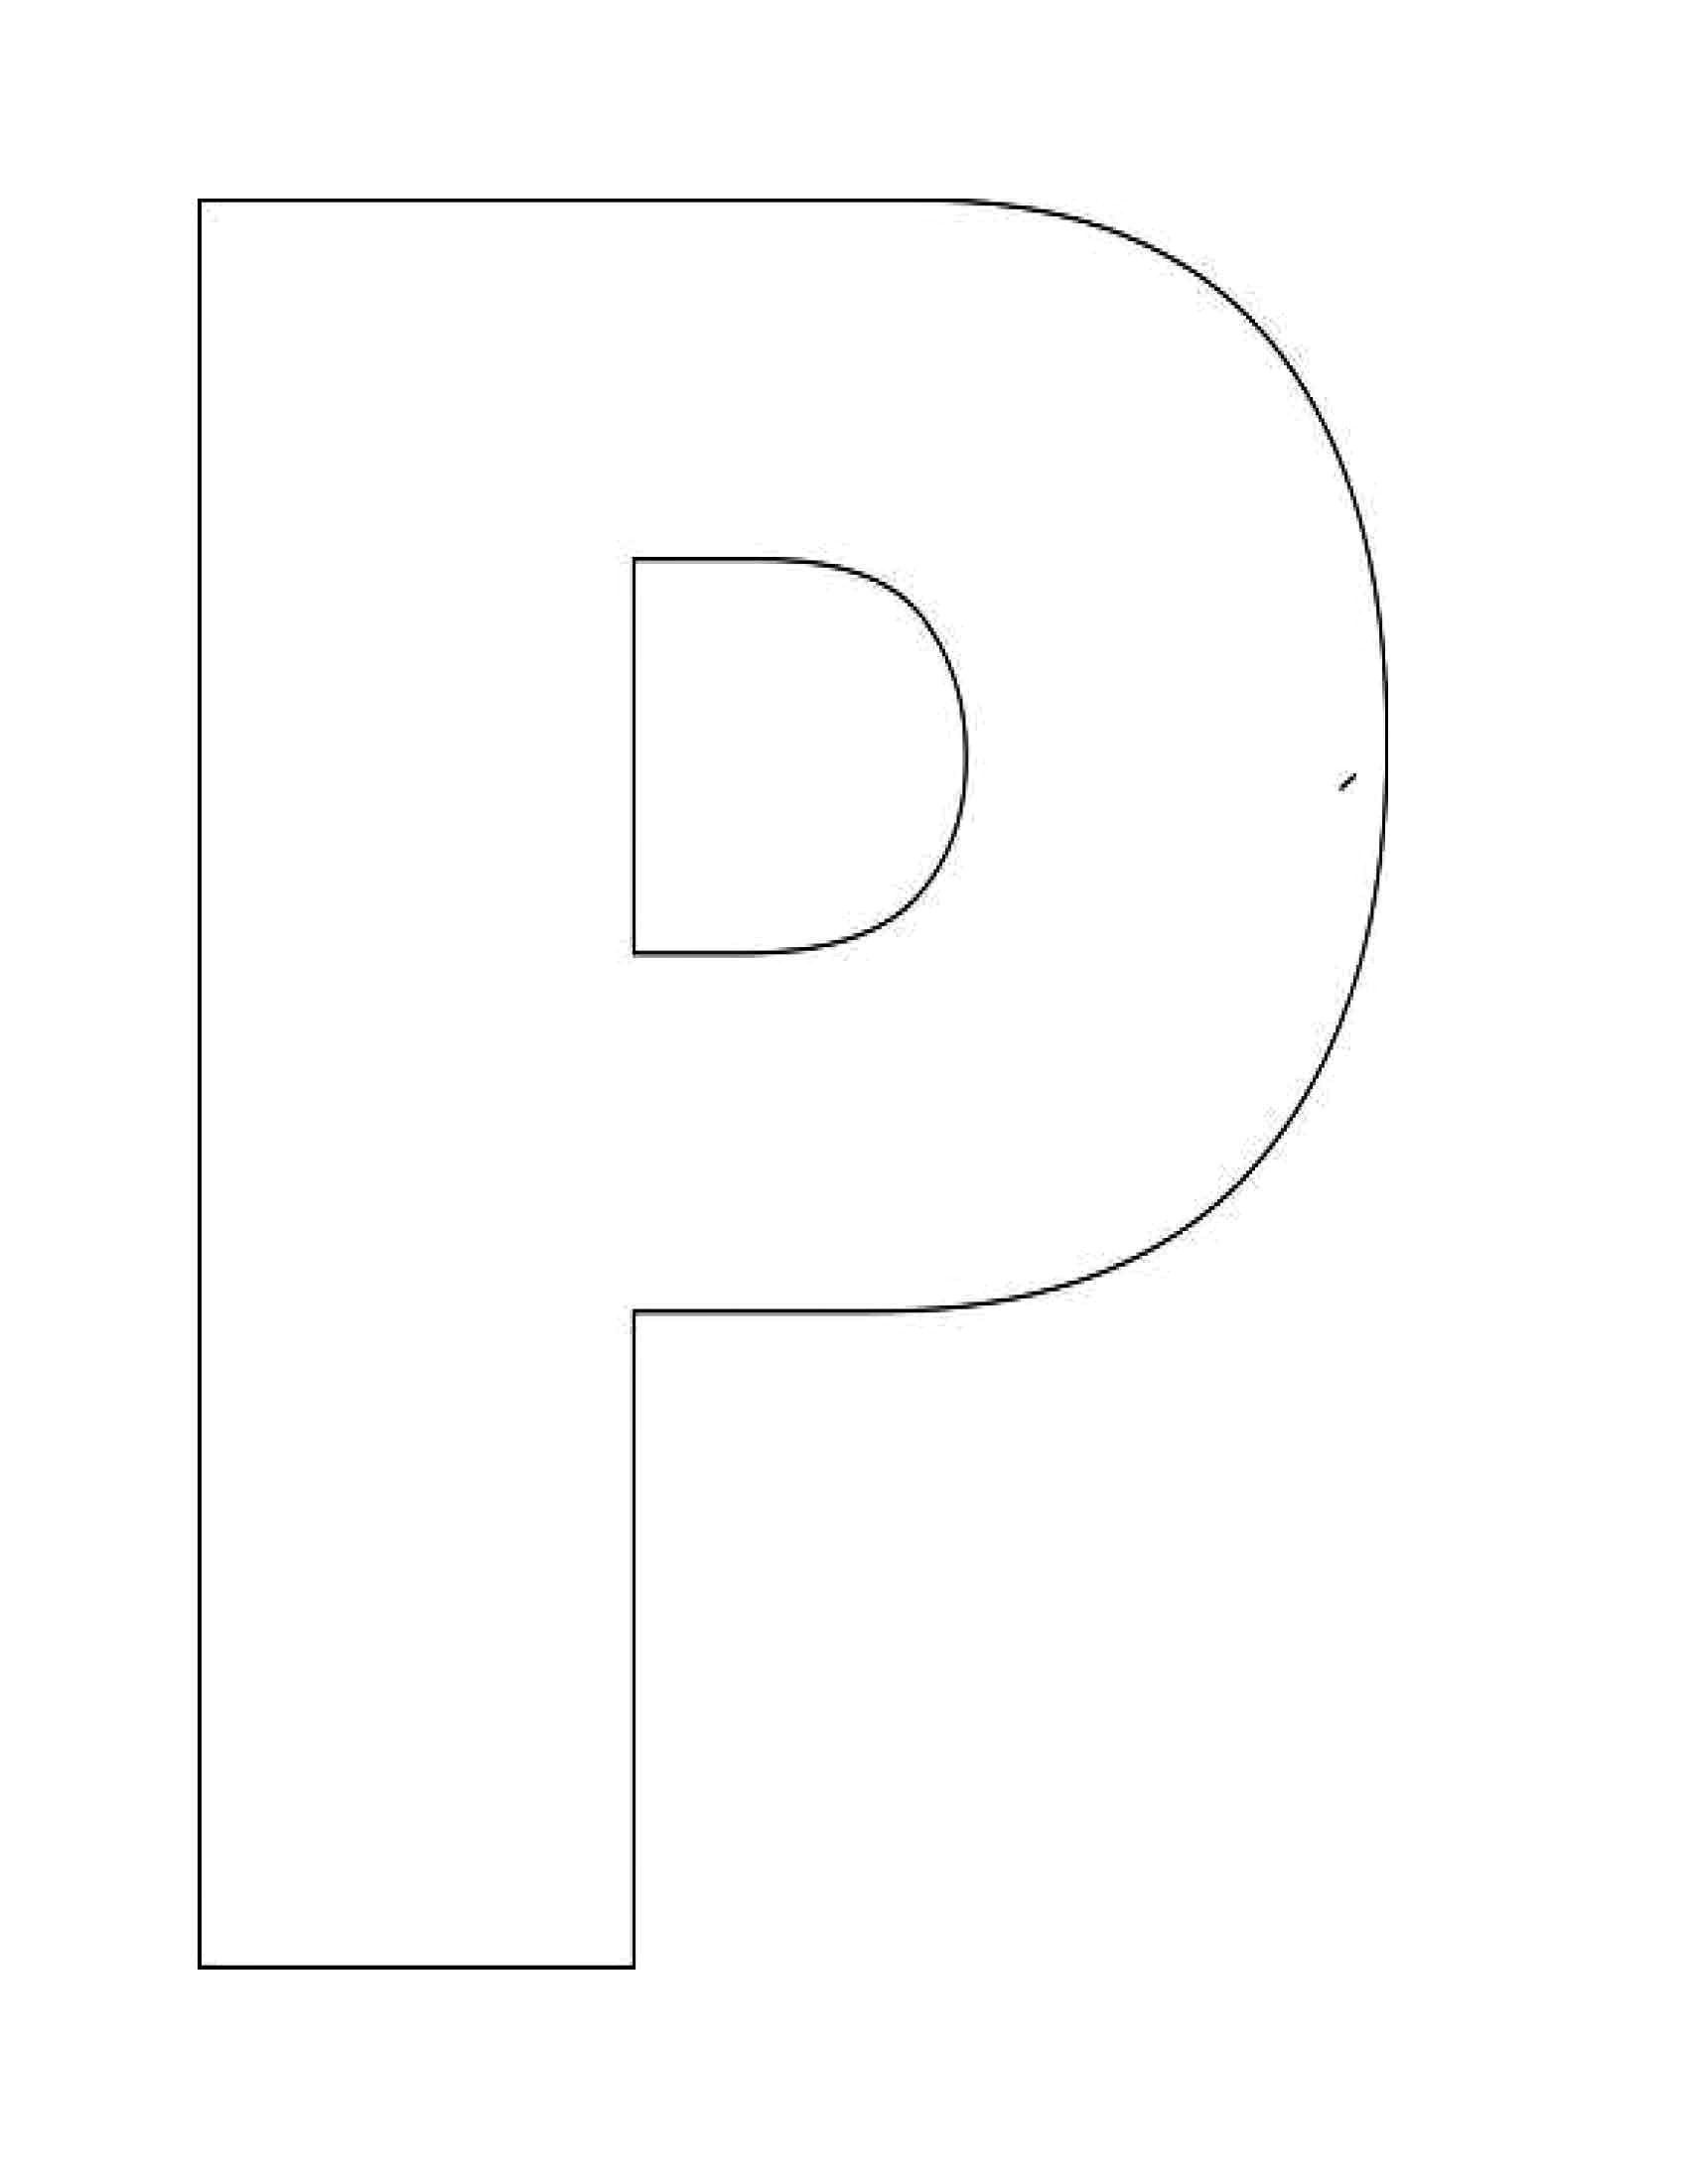 8 Preschool Alphabet Letters To Print Preschool Alphabet Letters Alphabet Letters To Print Lettering Alphabet